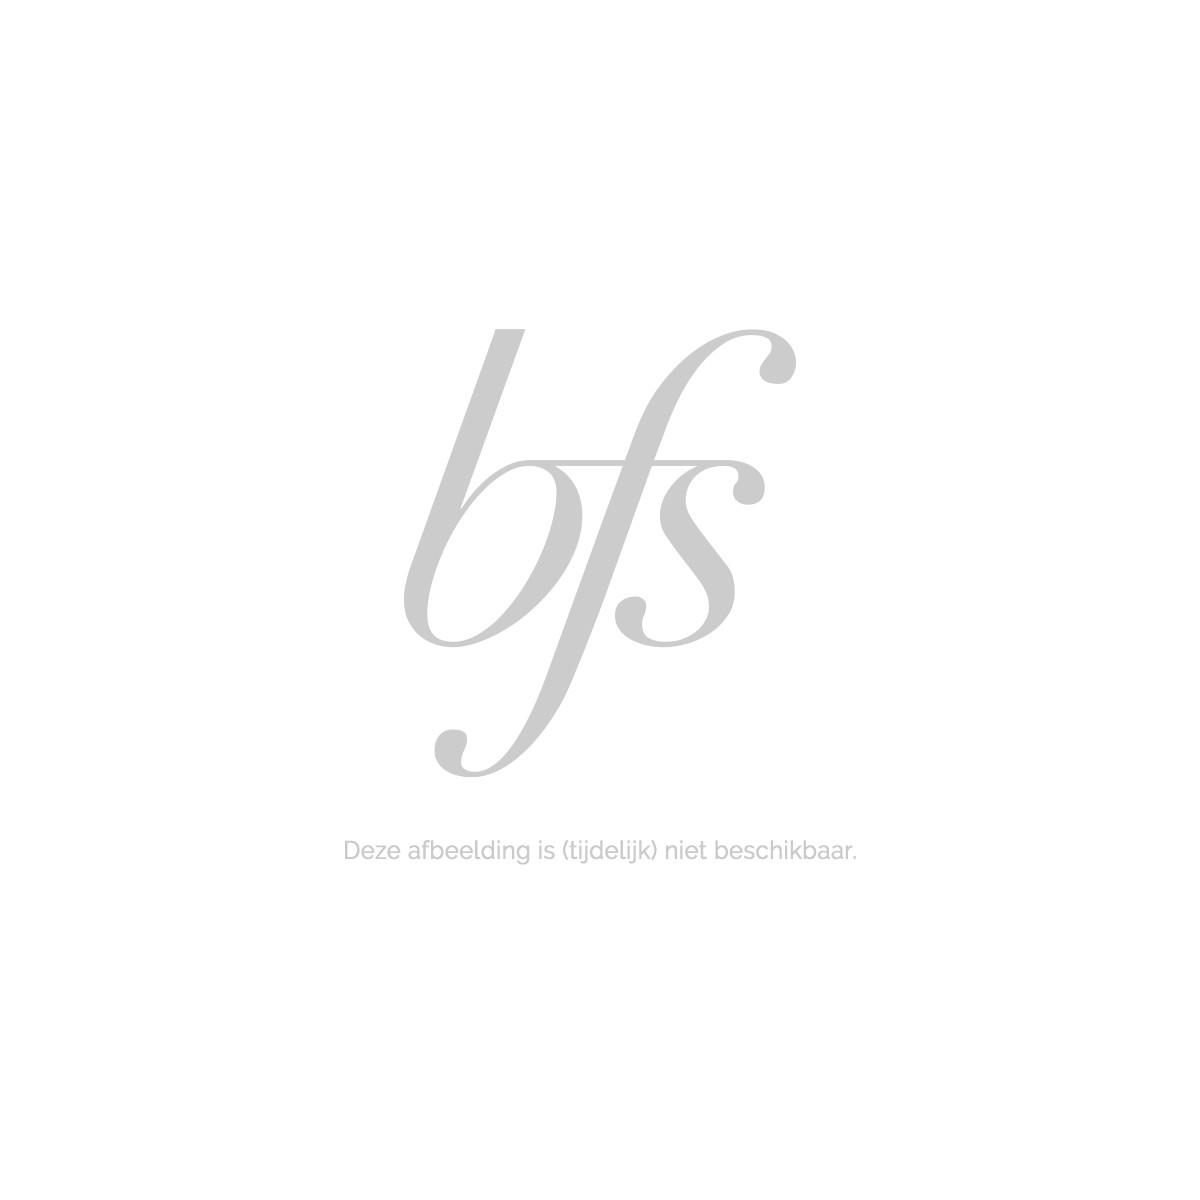 Christian Dior Addict Lip Maximizer 6 Ml